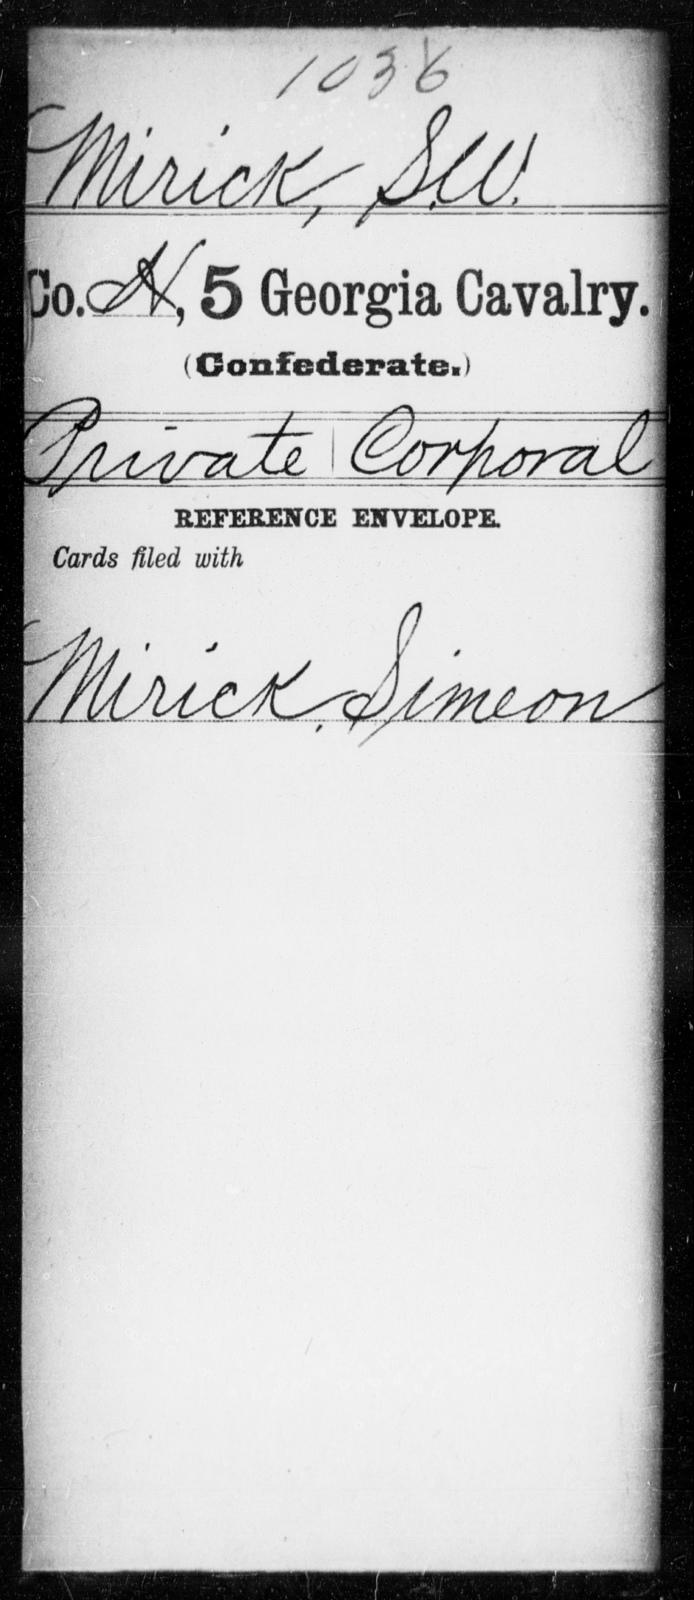 Mirick, S W - 5th Cavalry